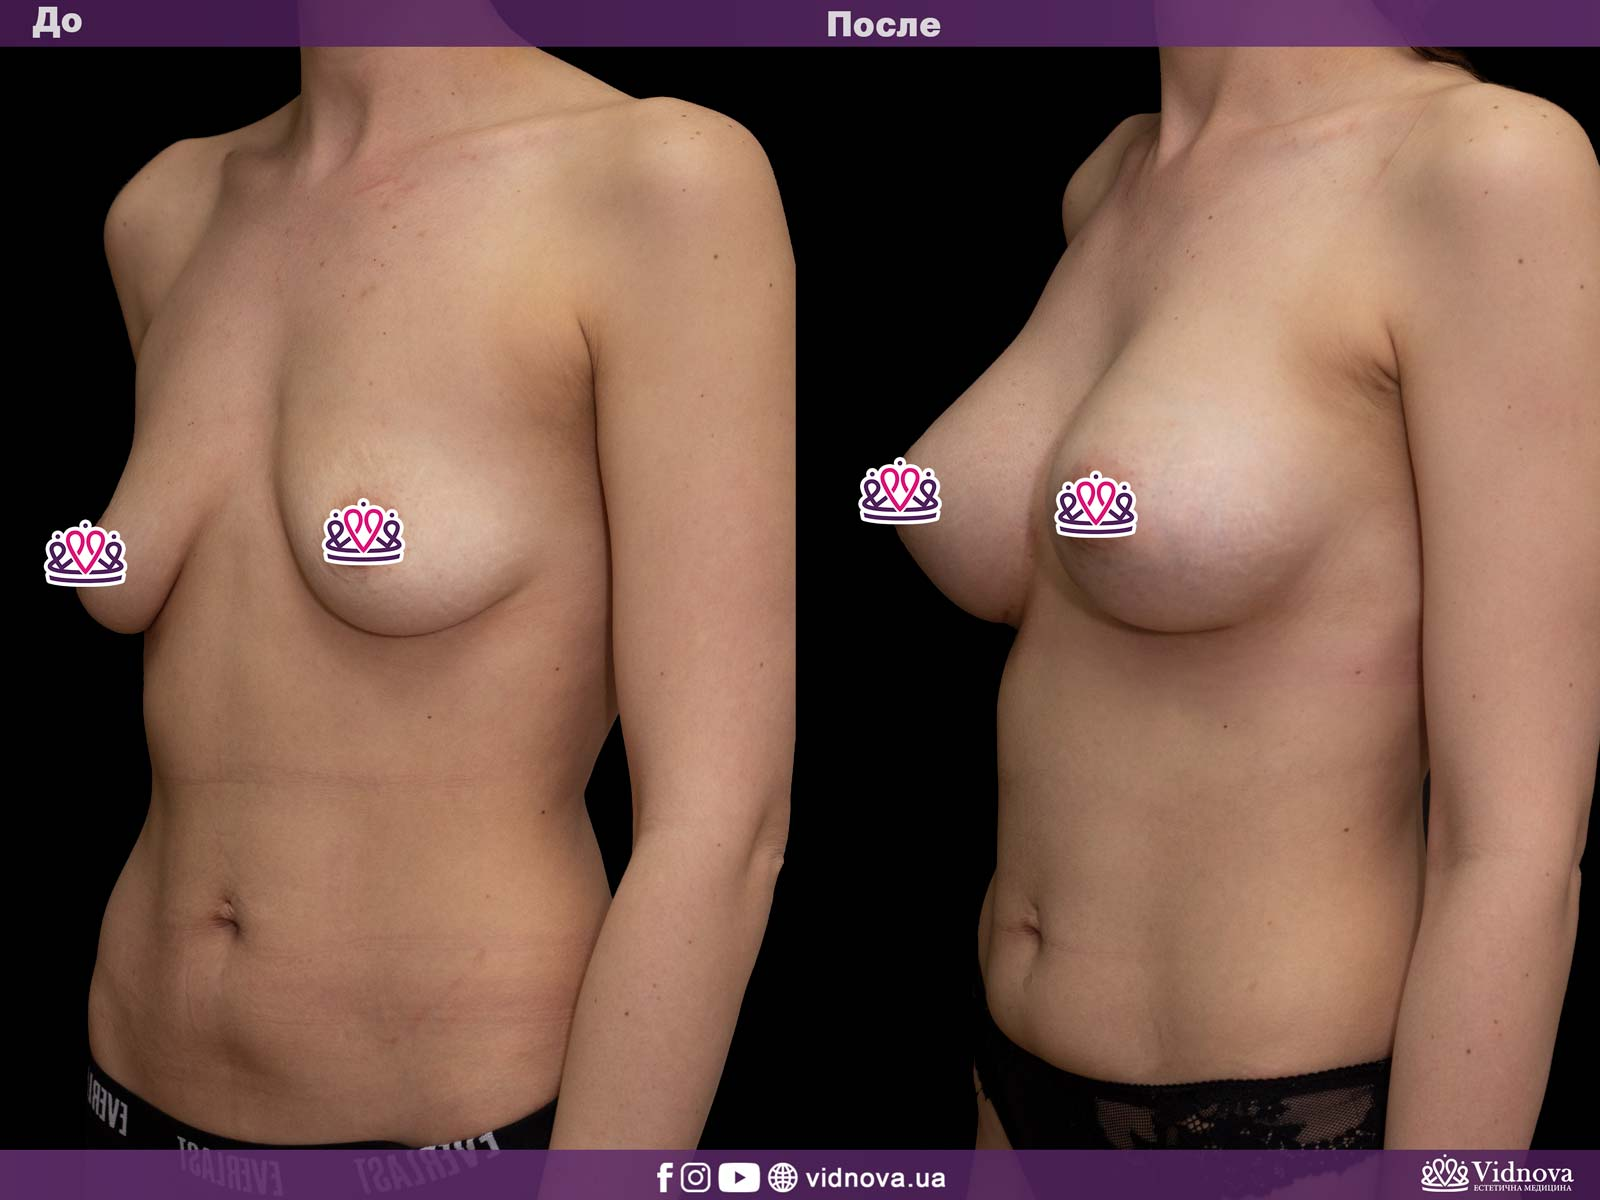 Увеличение груди: Фото ДО и ПОСЛЕ - Пример №12-2 - Клиника Vidnova